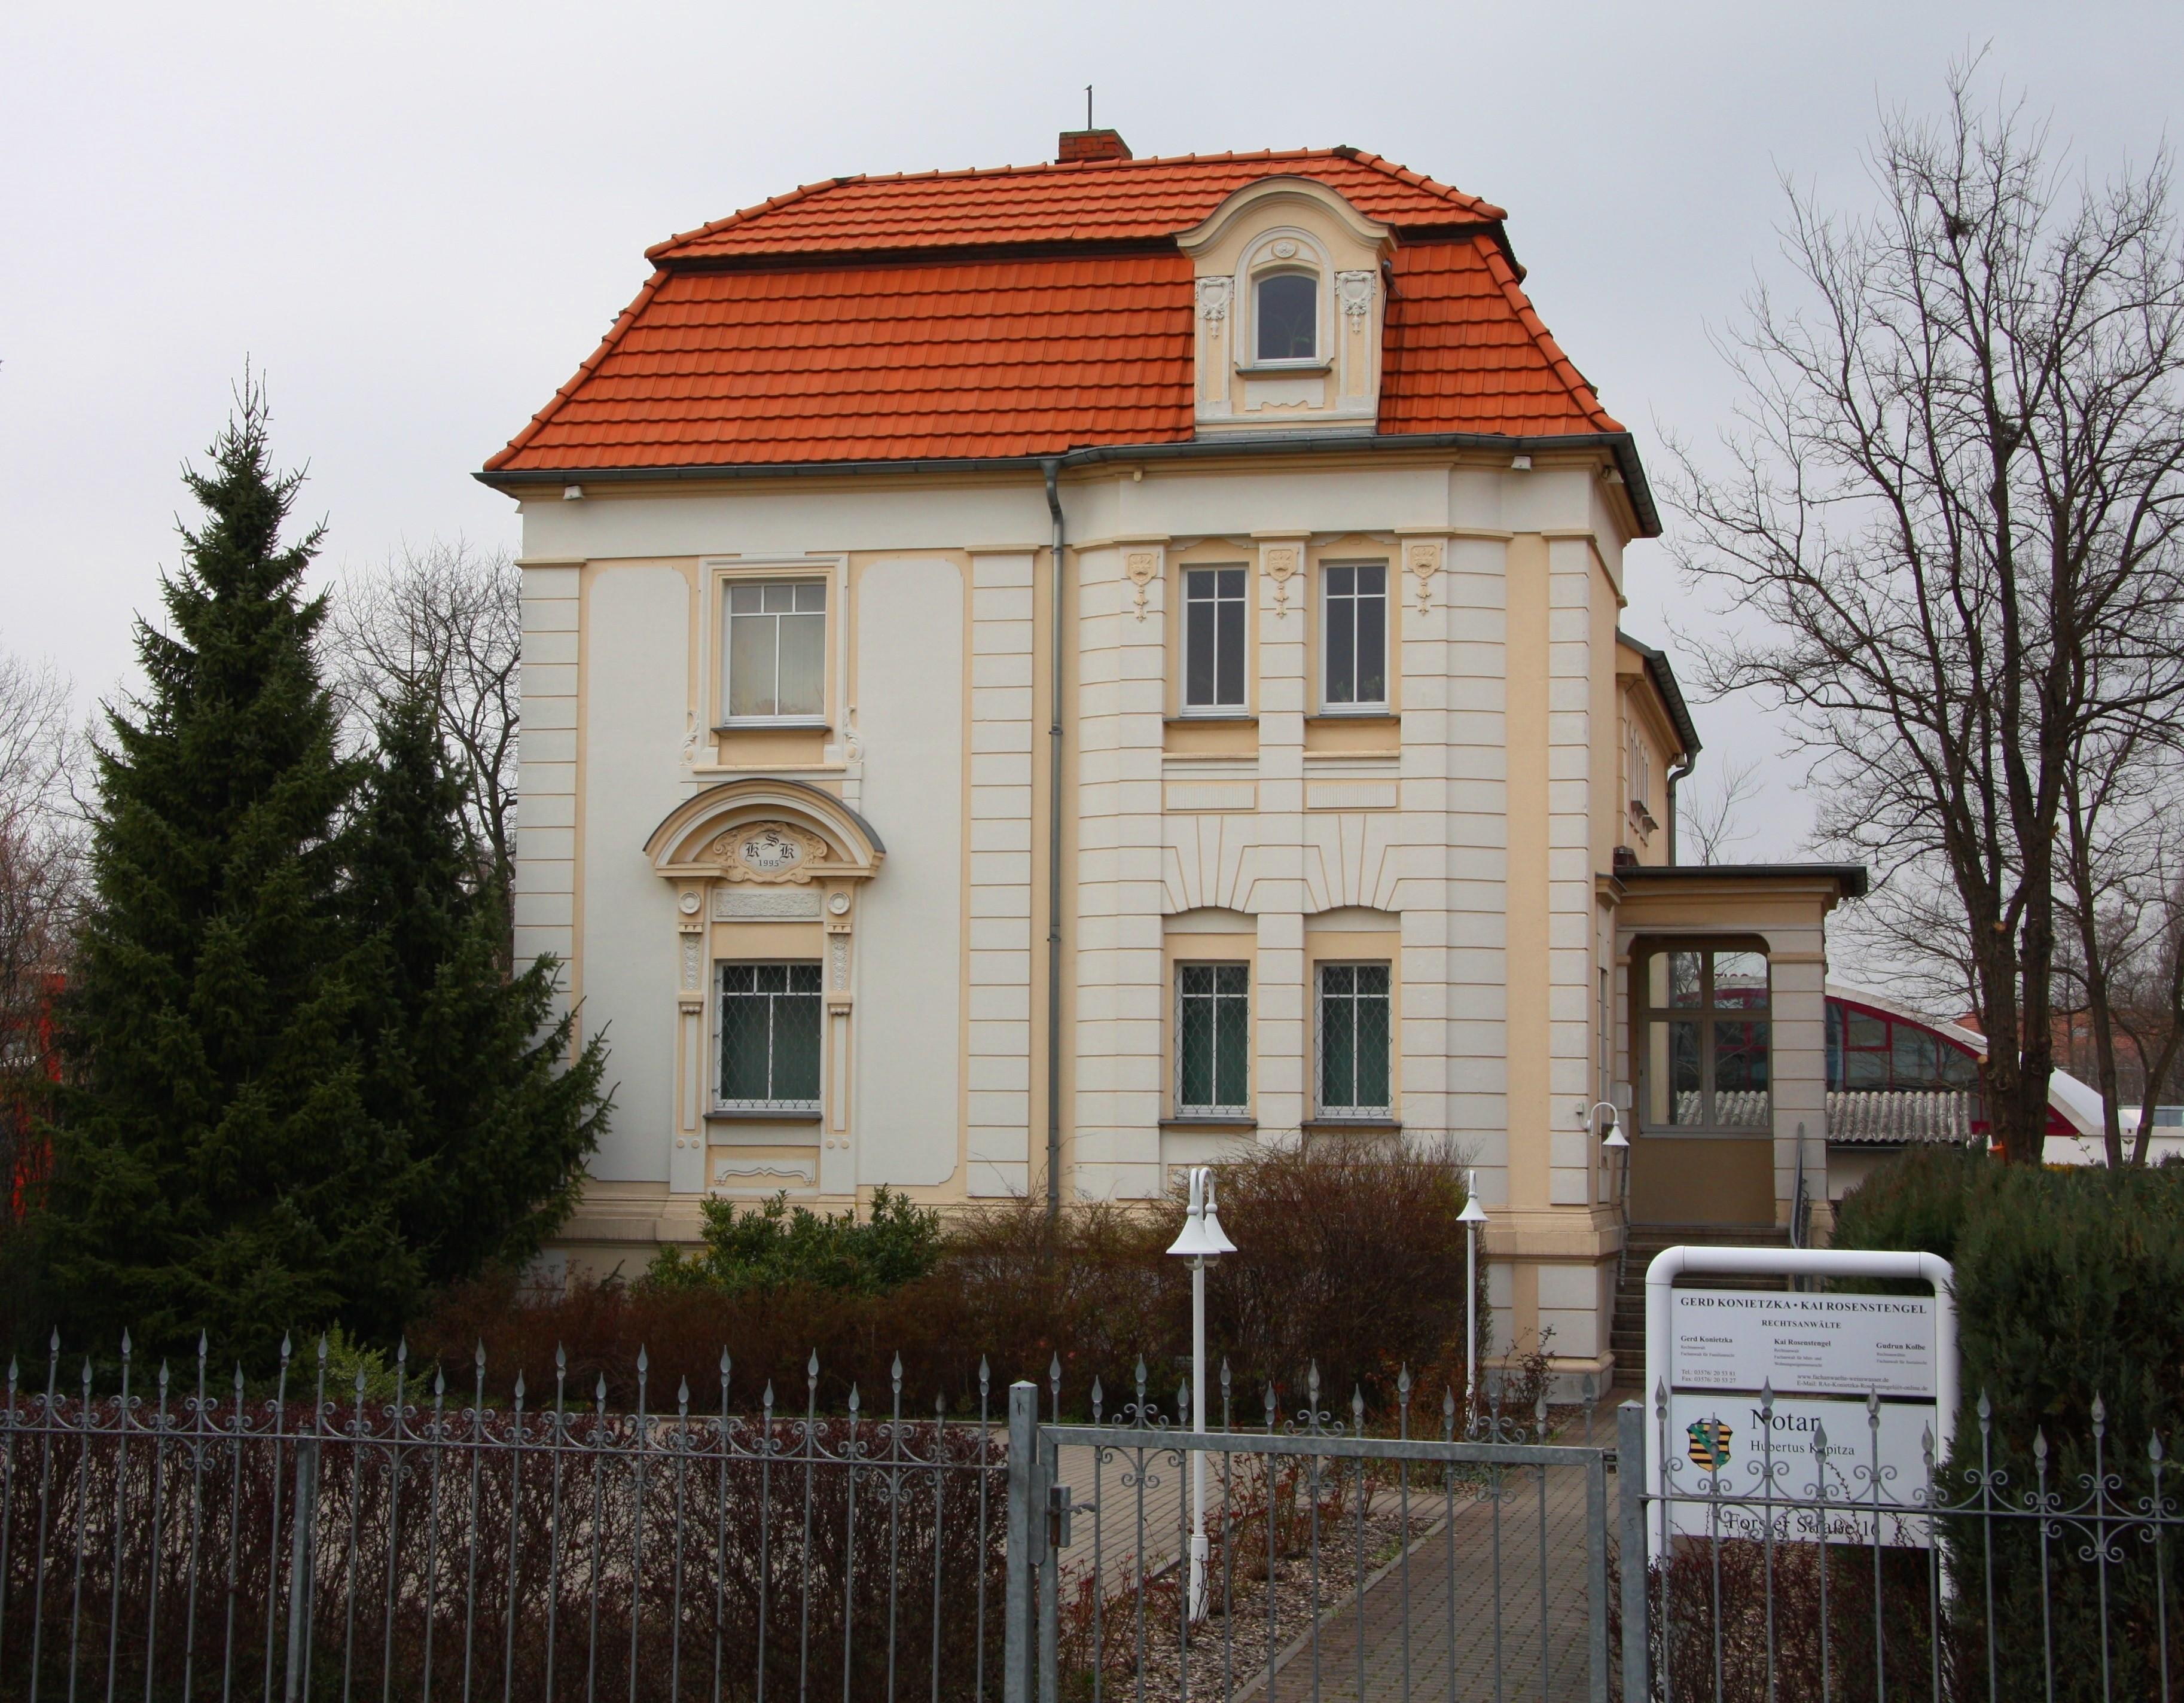 Konietzka & Rosenstengel GbR Rechtsanwälte